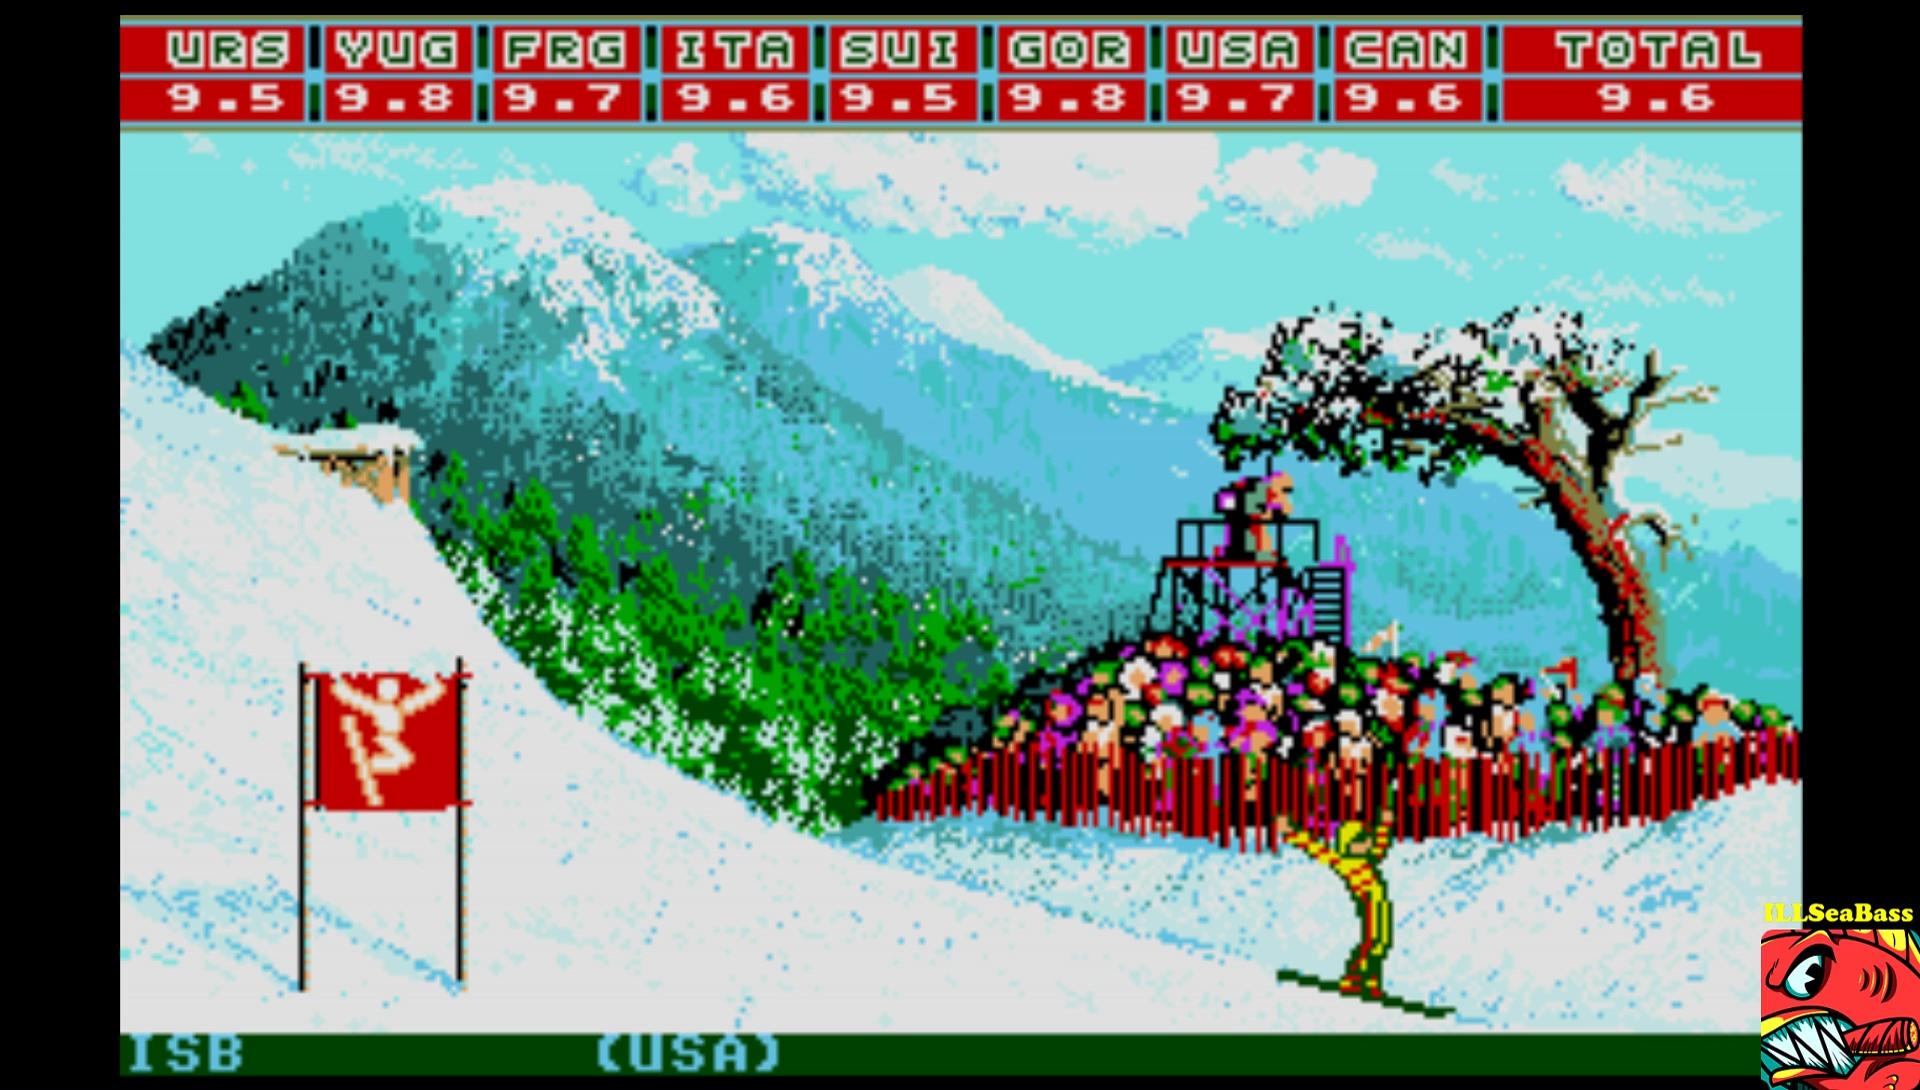 ILLSeaBass: Winter Games: Hot Dog (Atari ST Emulated) 96 points on 2017-03-04 16:55:25